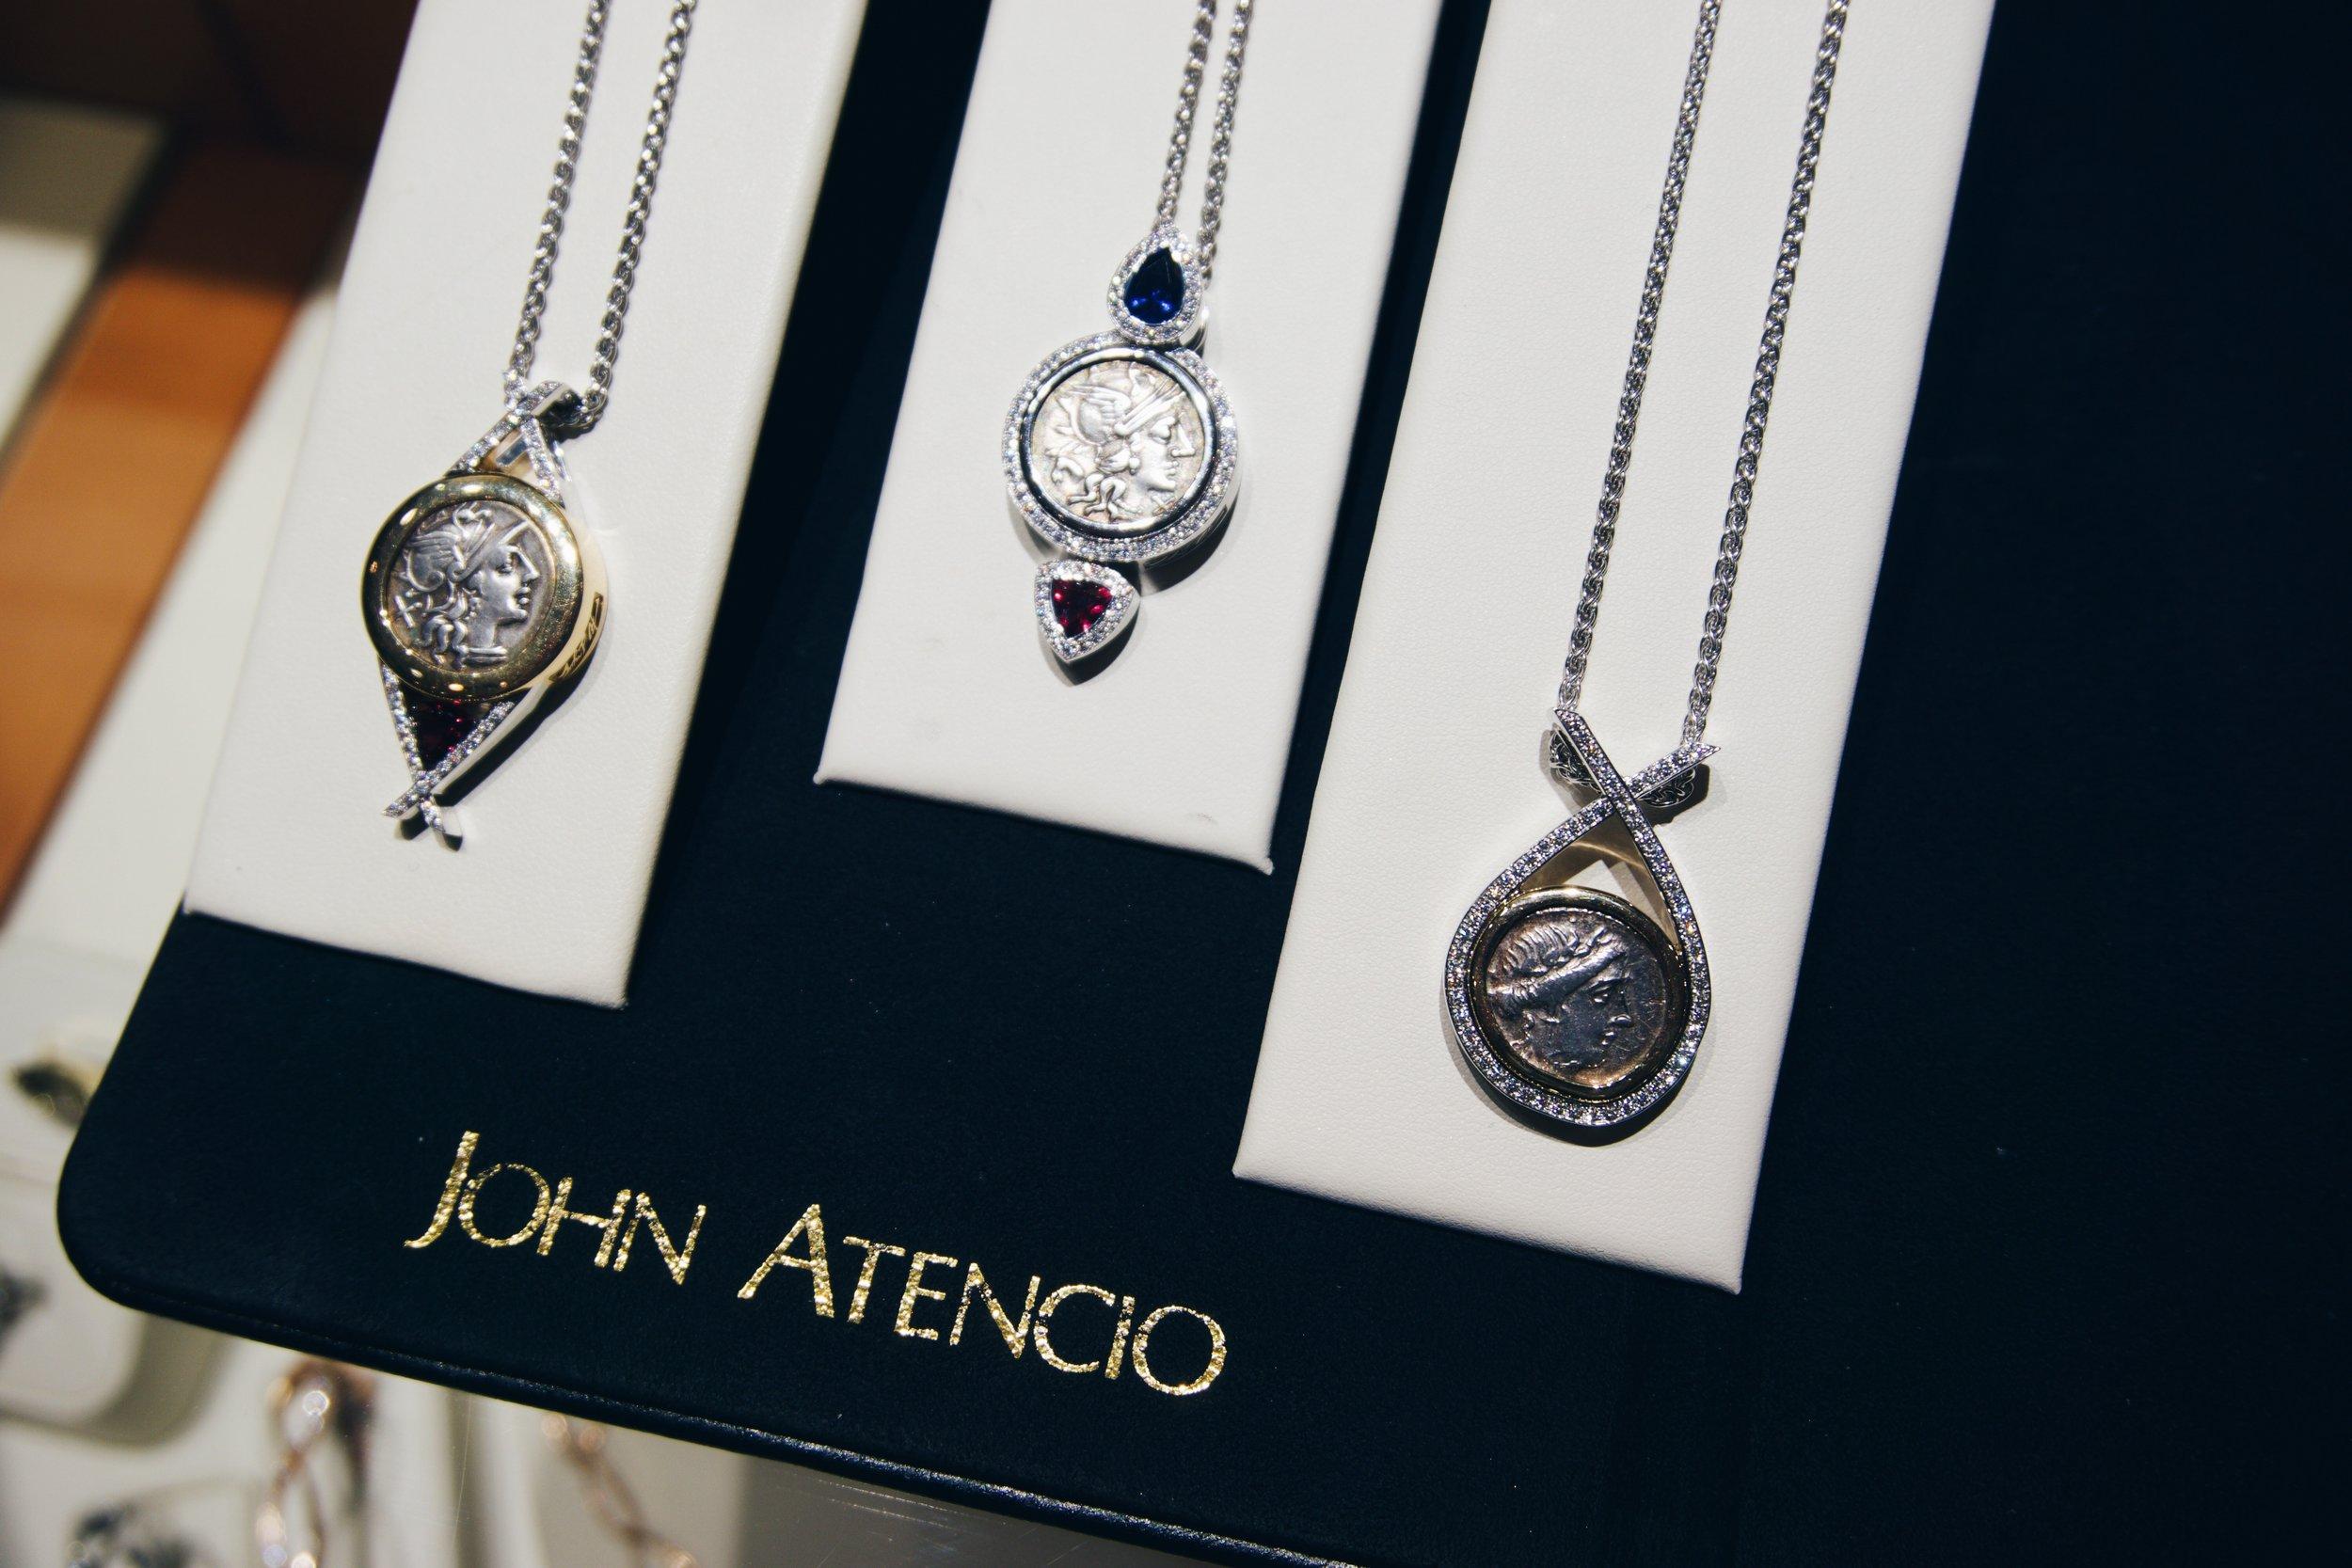 Denver Designer John Atencio Raeann Langas